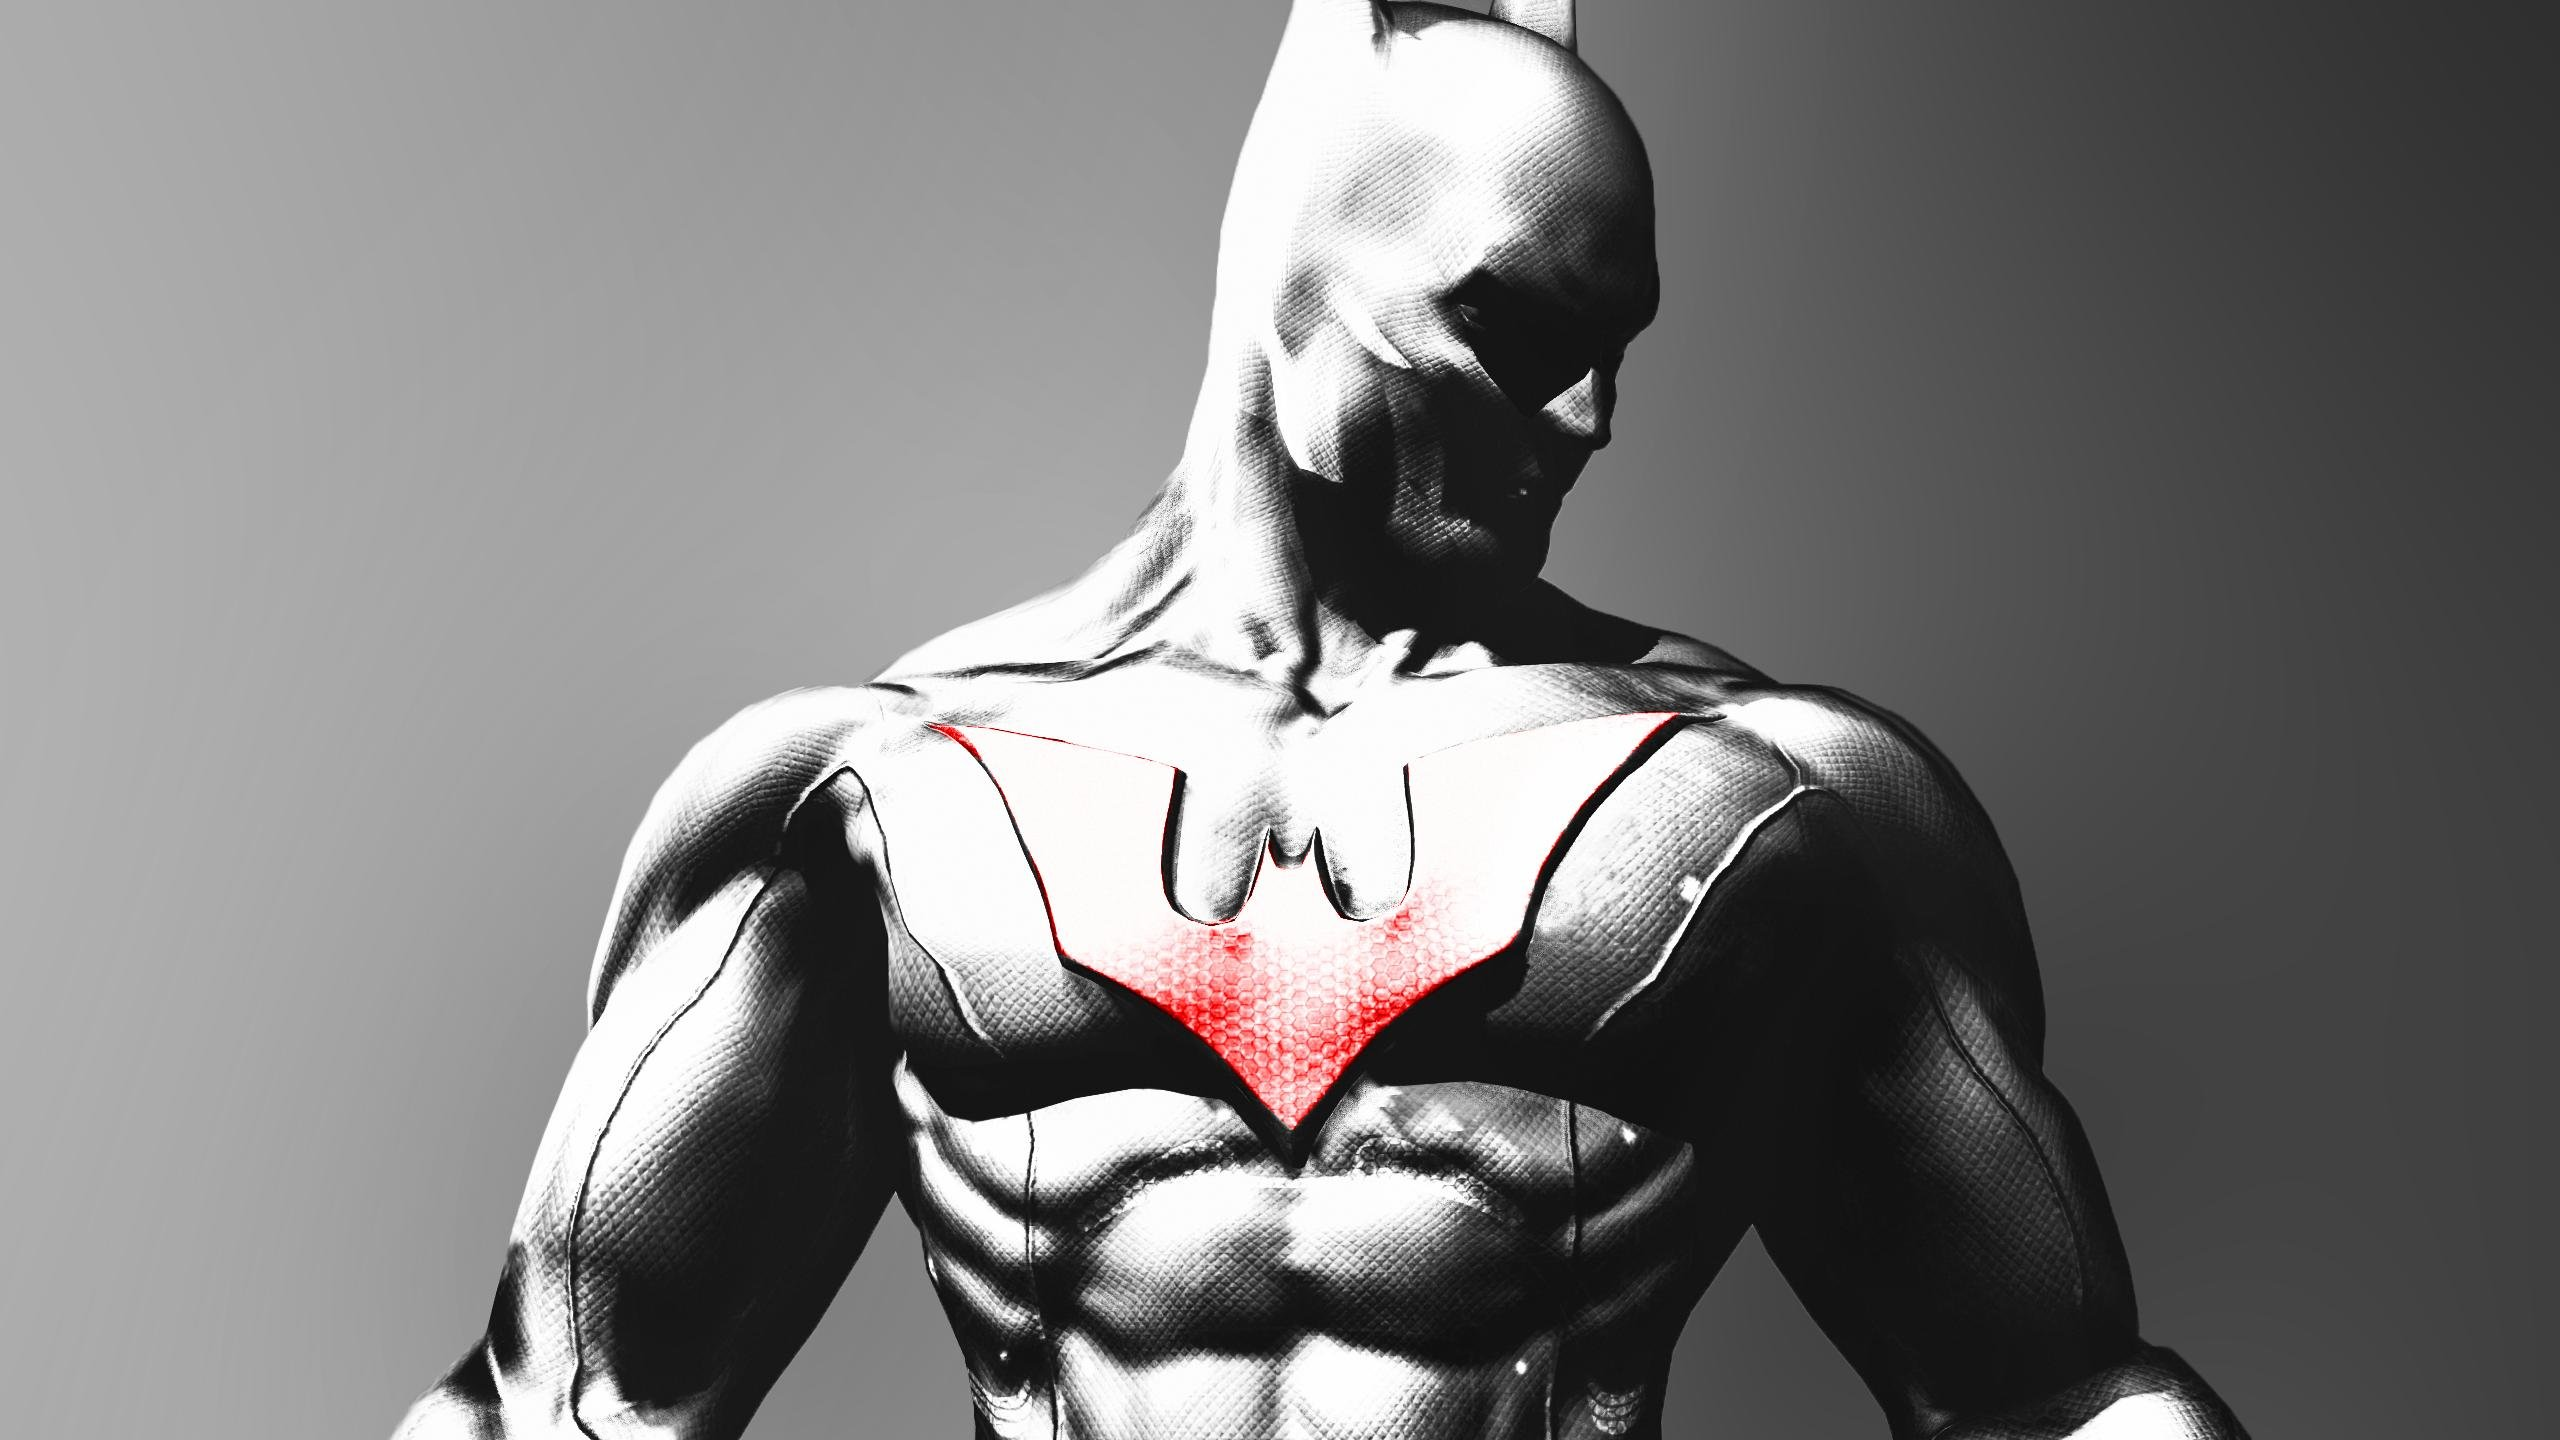 High Resolution Batman Beyond Hd 2560x1440 Wallpaper Id421036 For Pc